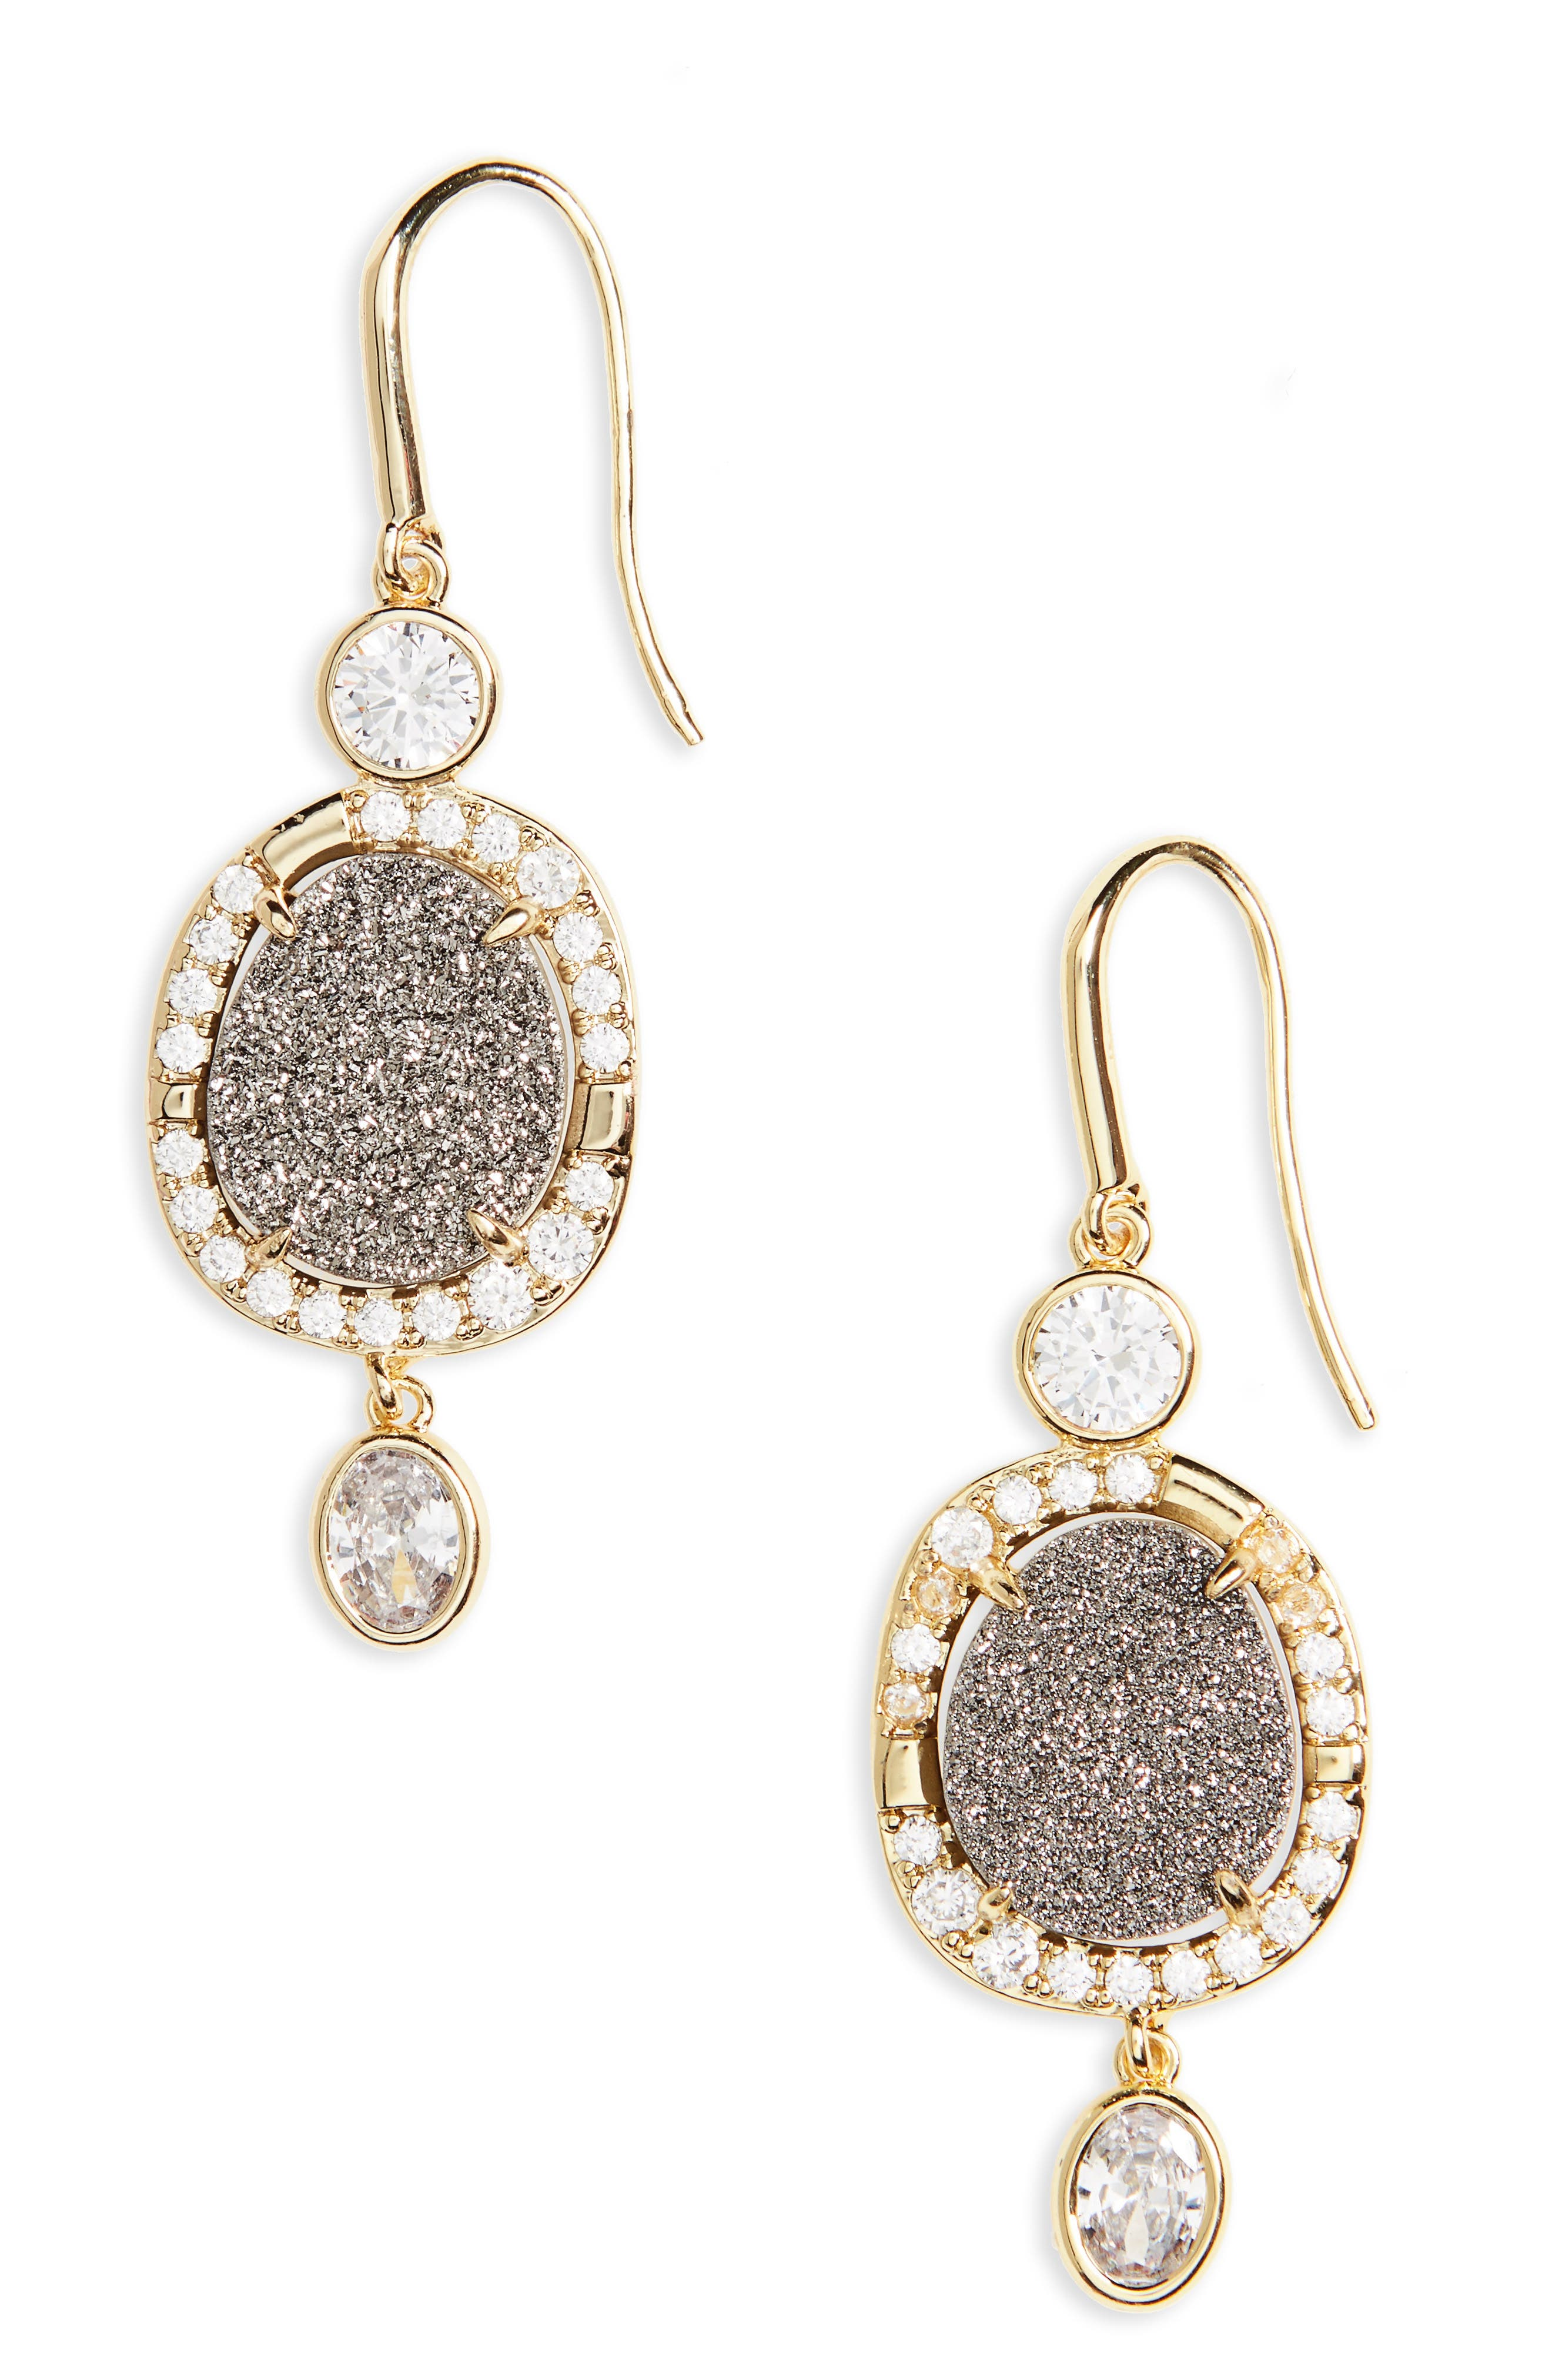 MC Drusy Drop Earrings,                         Main,                         color, Grey Druzy/ Gold